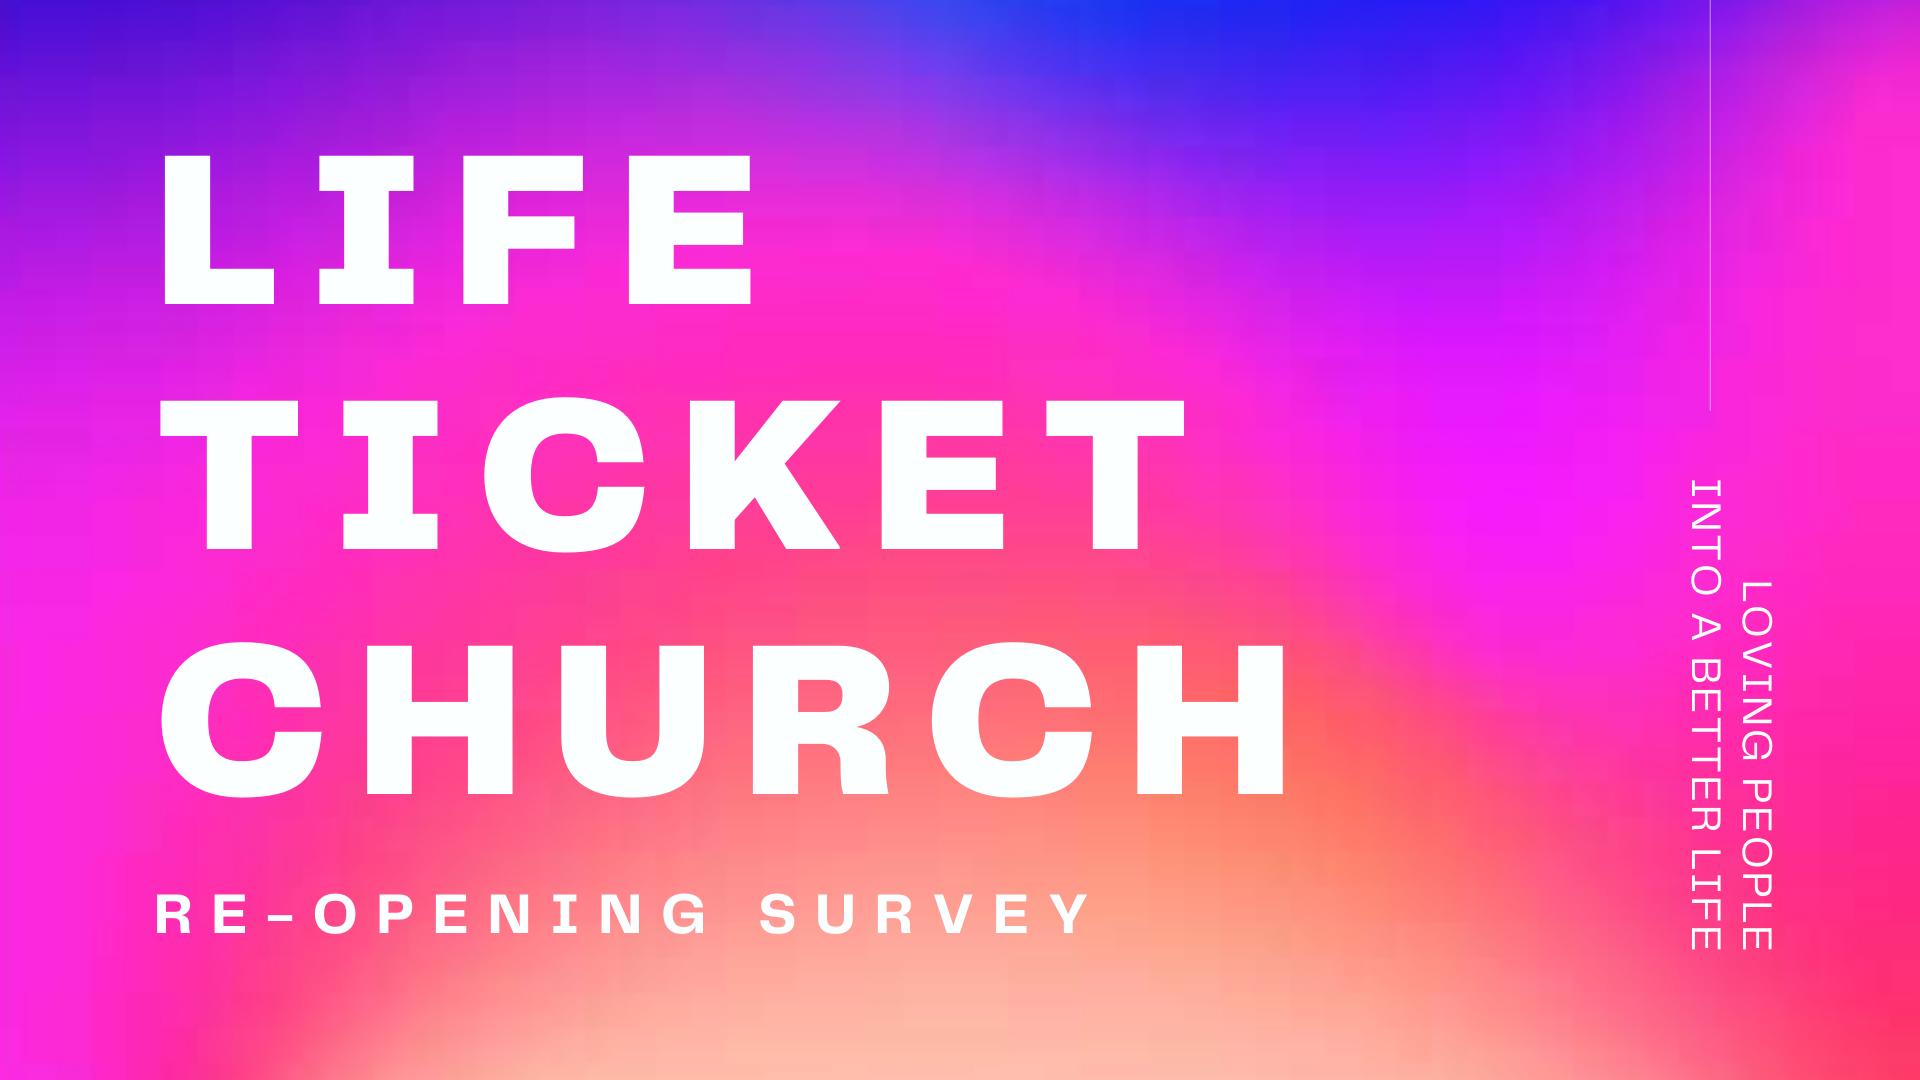 Re opening survey